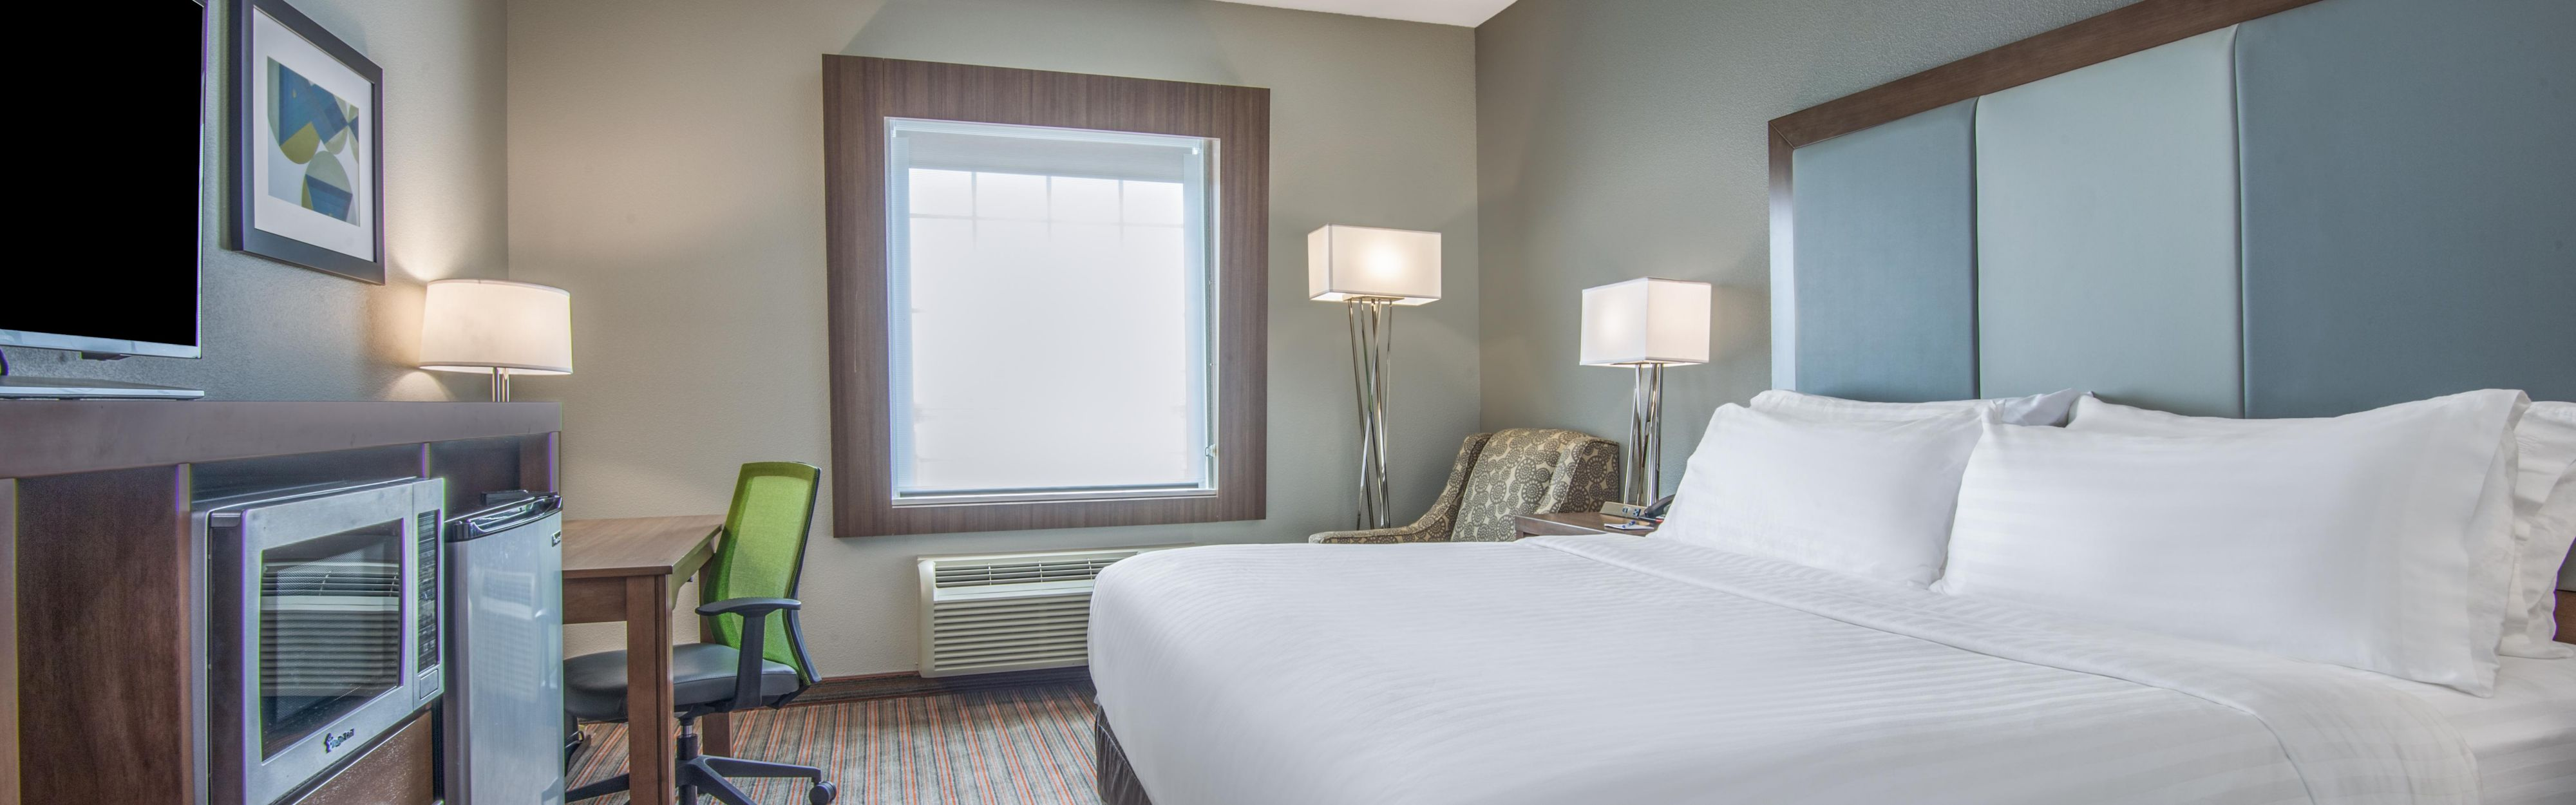 Holiday Inn Express & Suites Stillwater - University Area image 1